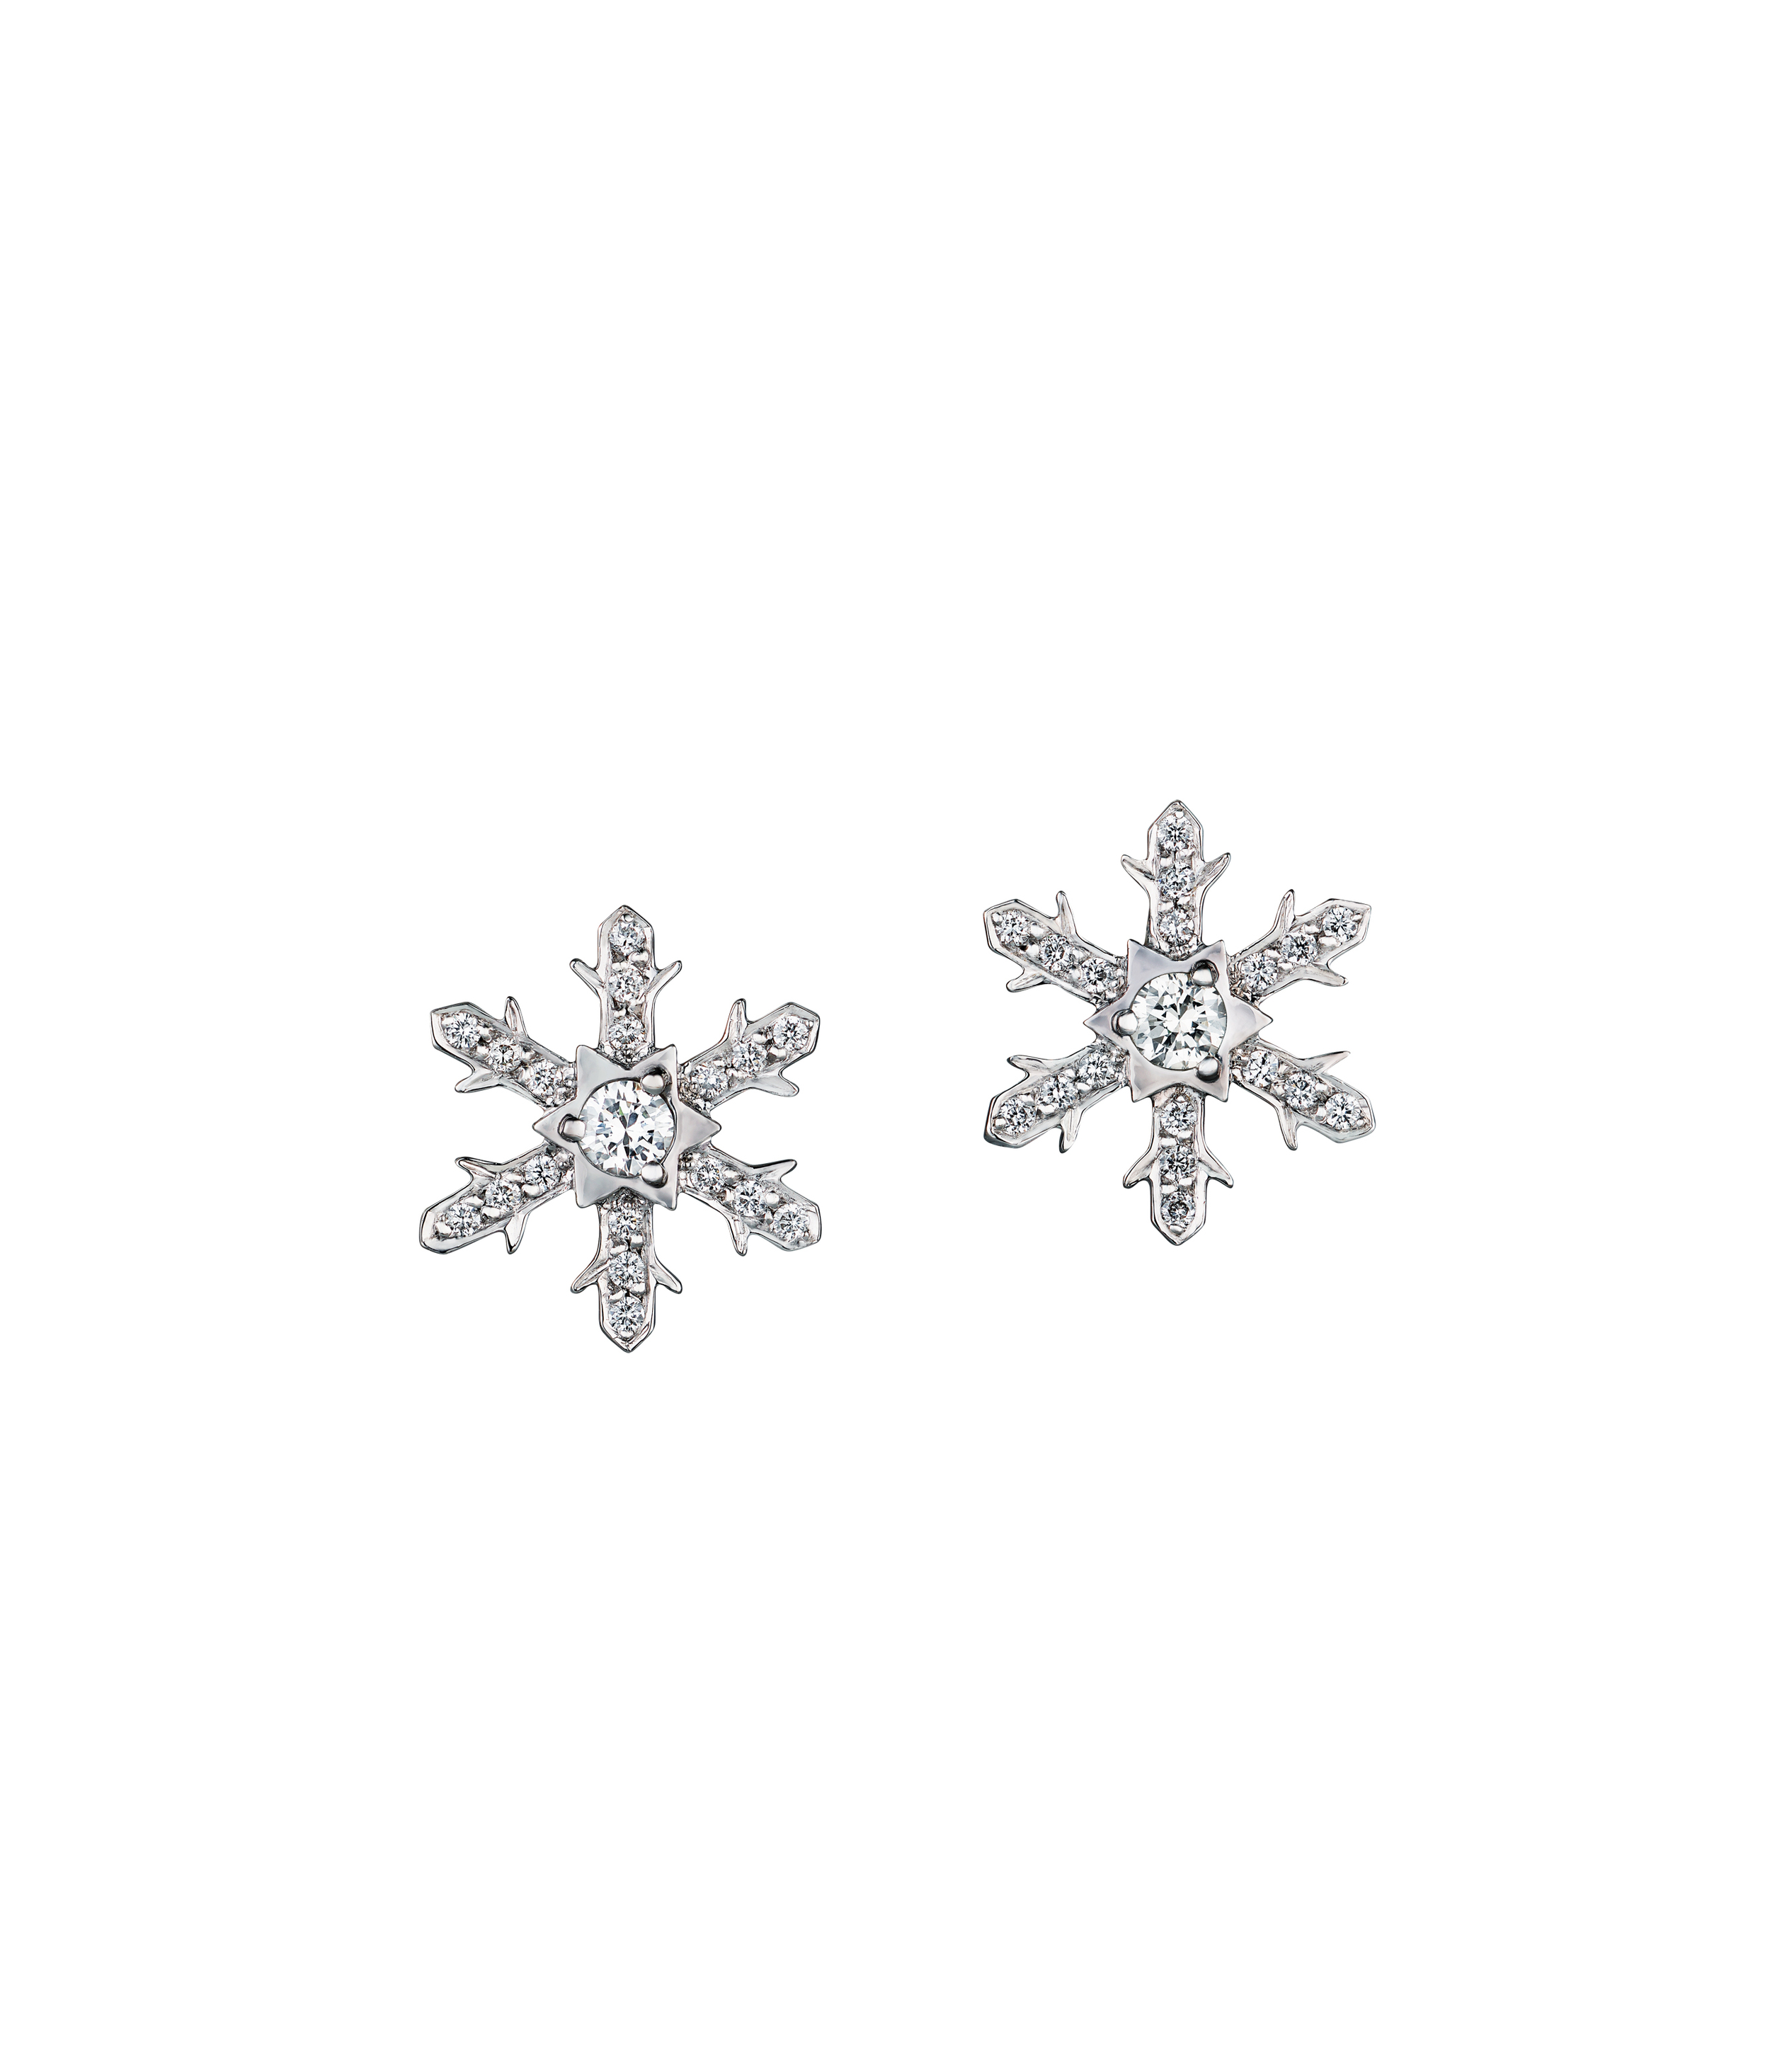 Faberge 'Anna' diamond earrings. $3,380